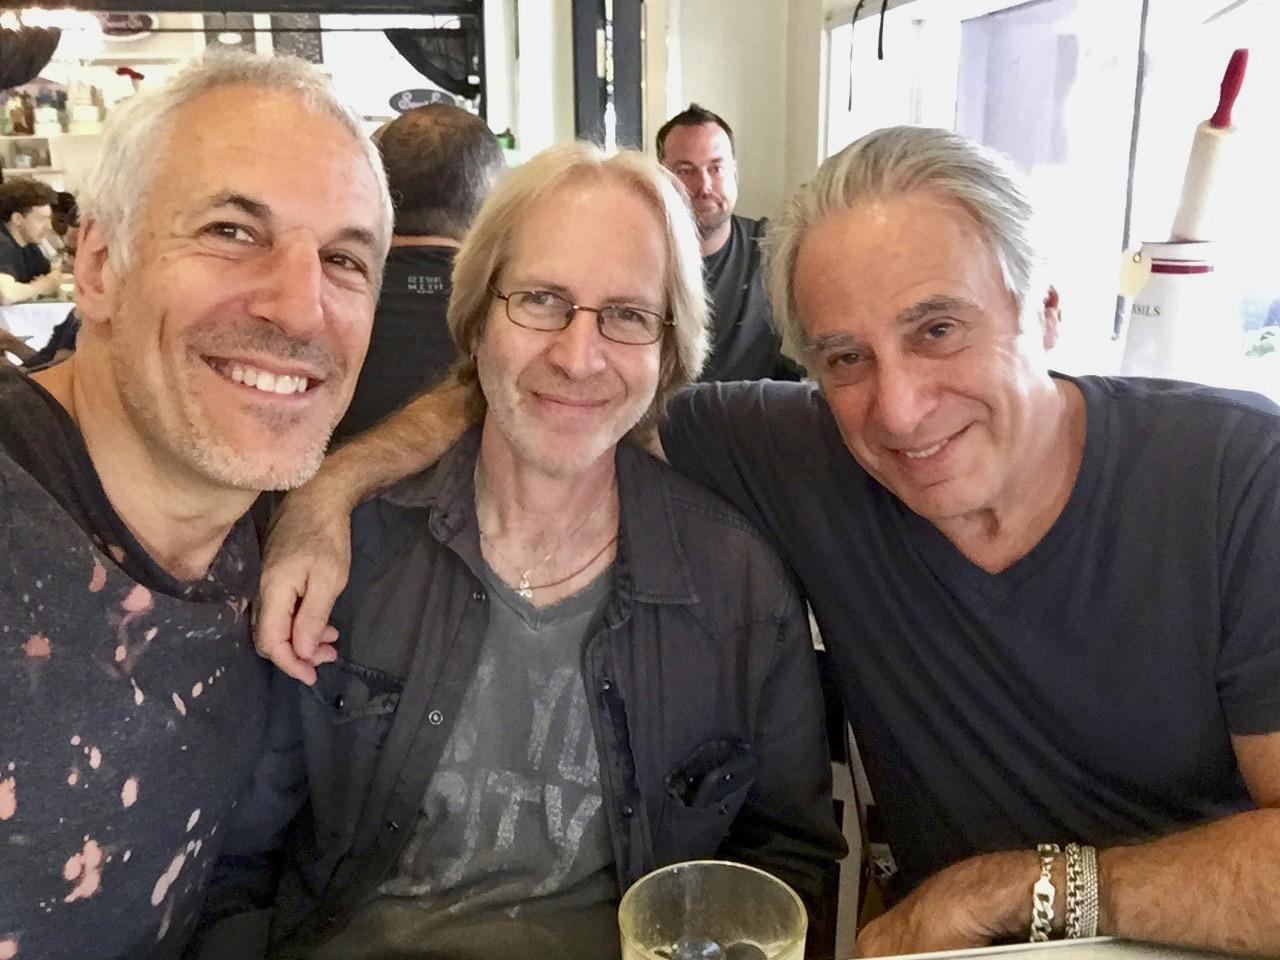 w/ Steve Postel & Danny Kortchmar